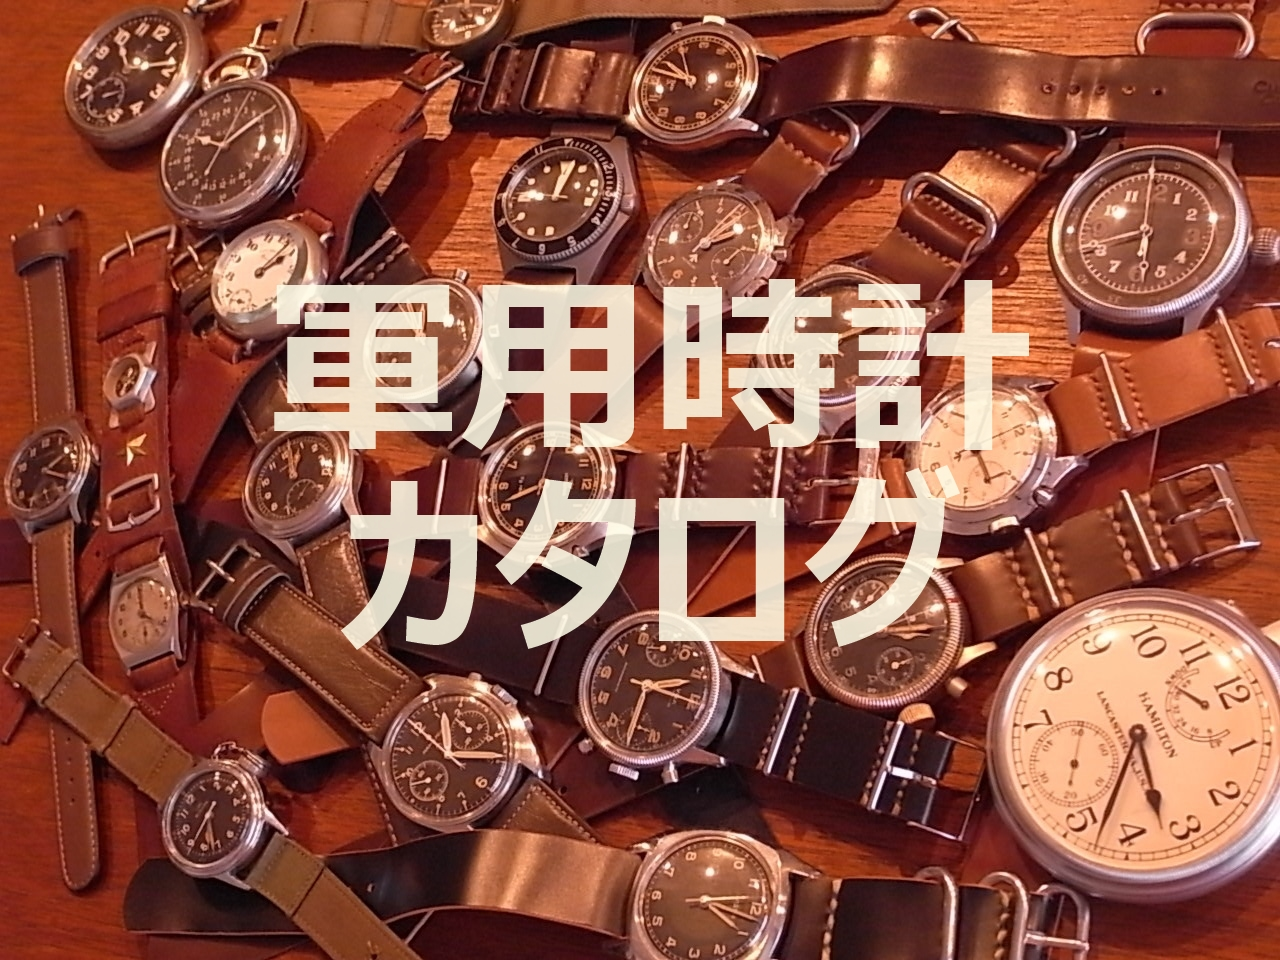 NEWコンテンツ! 軍用時計カタログ!